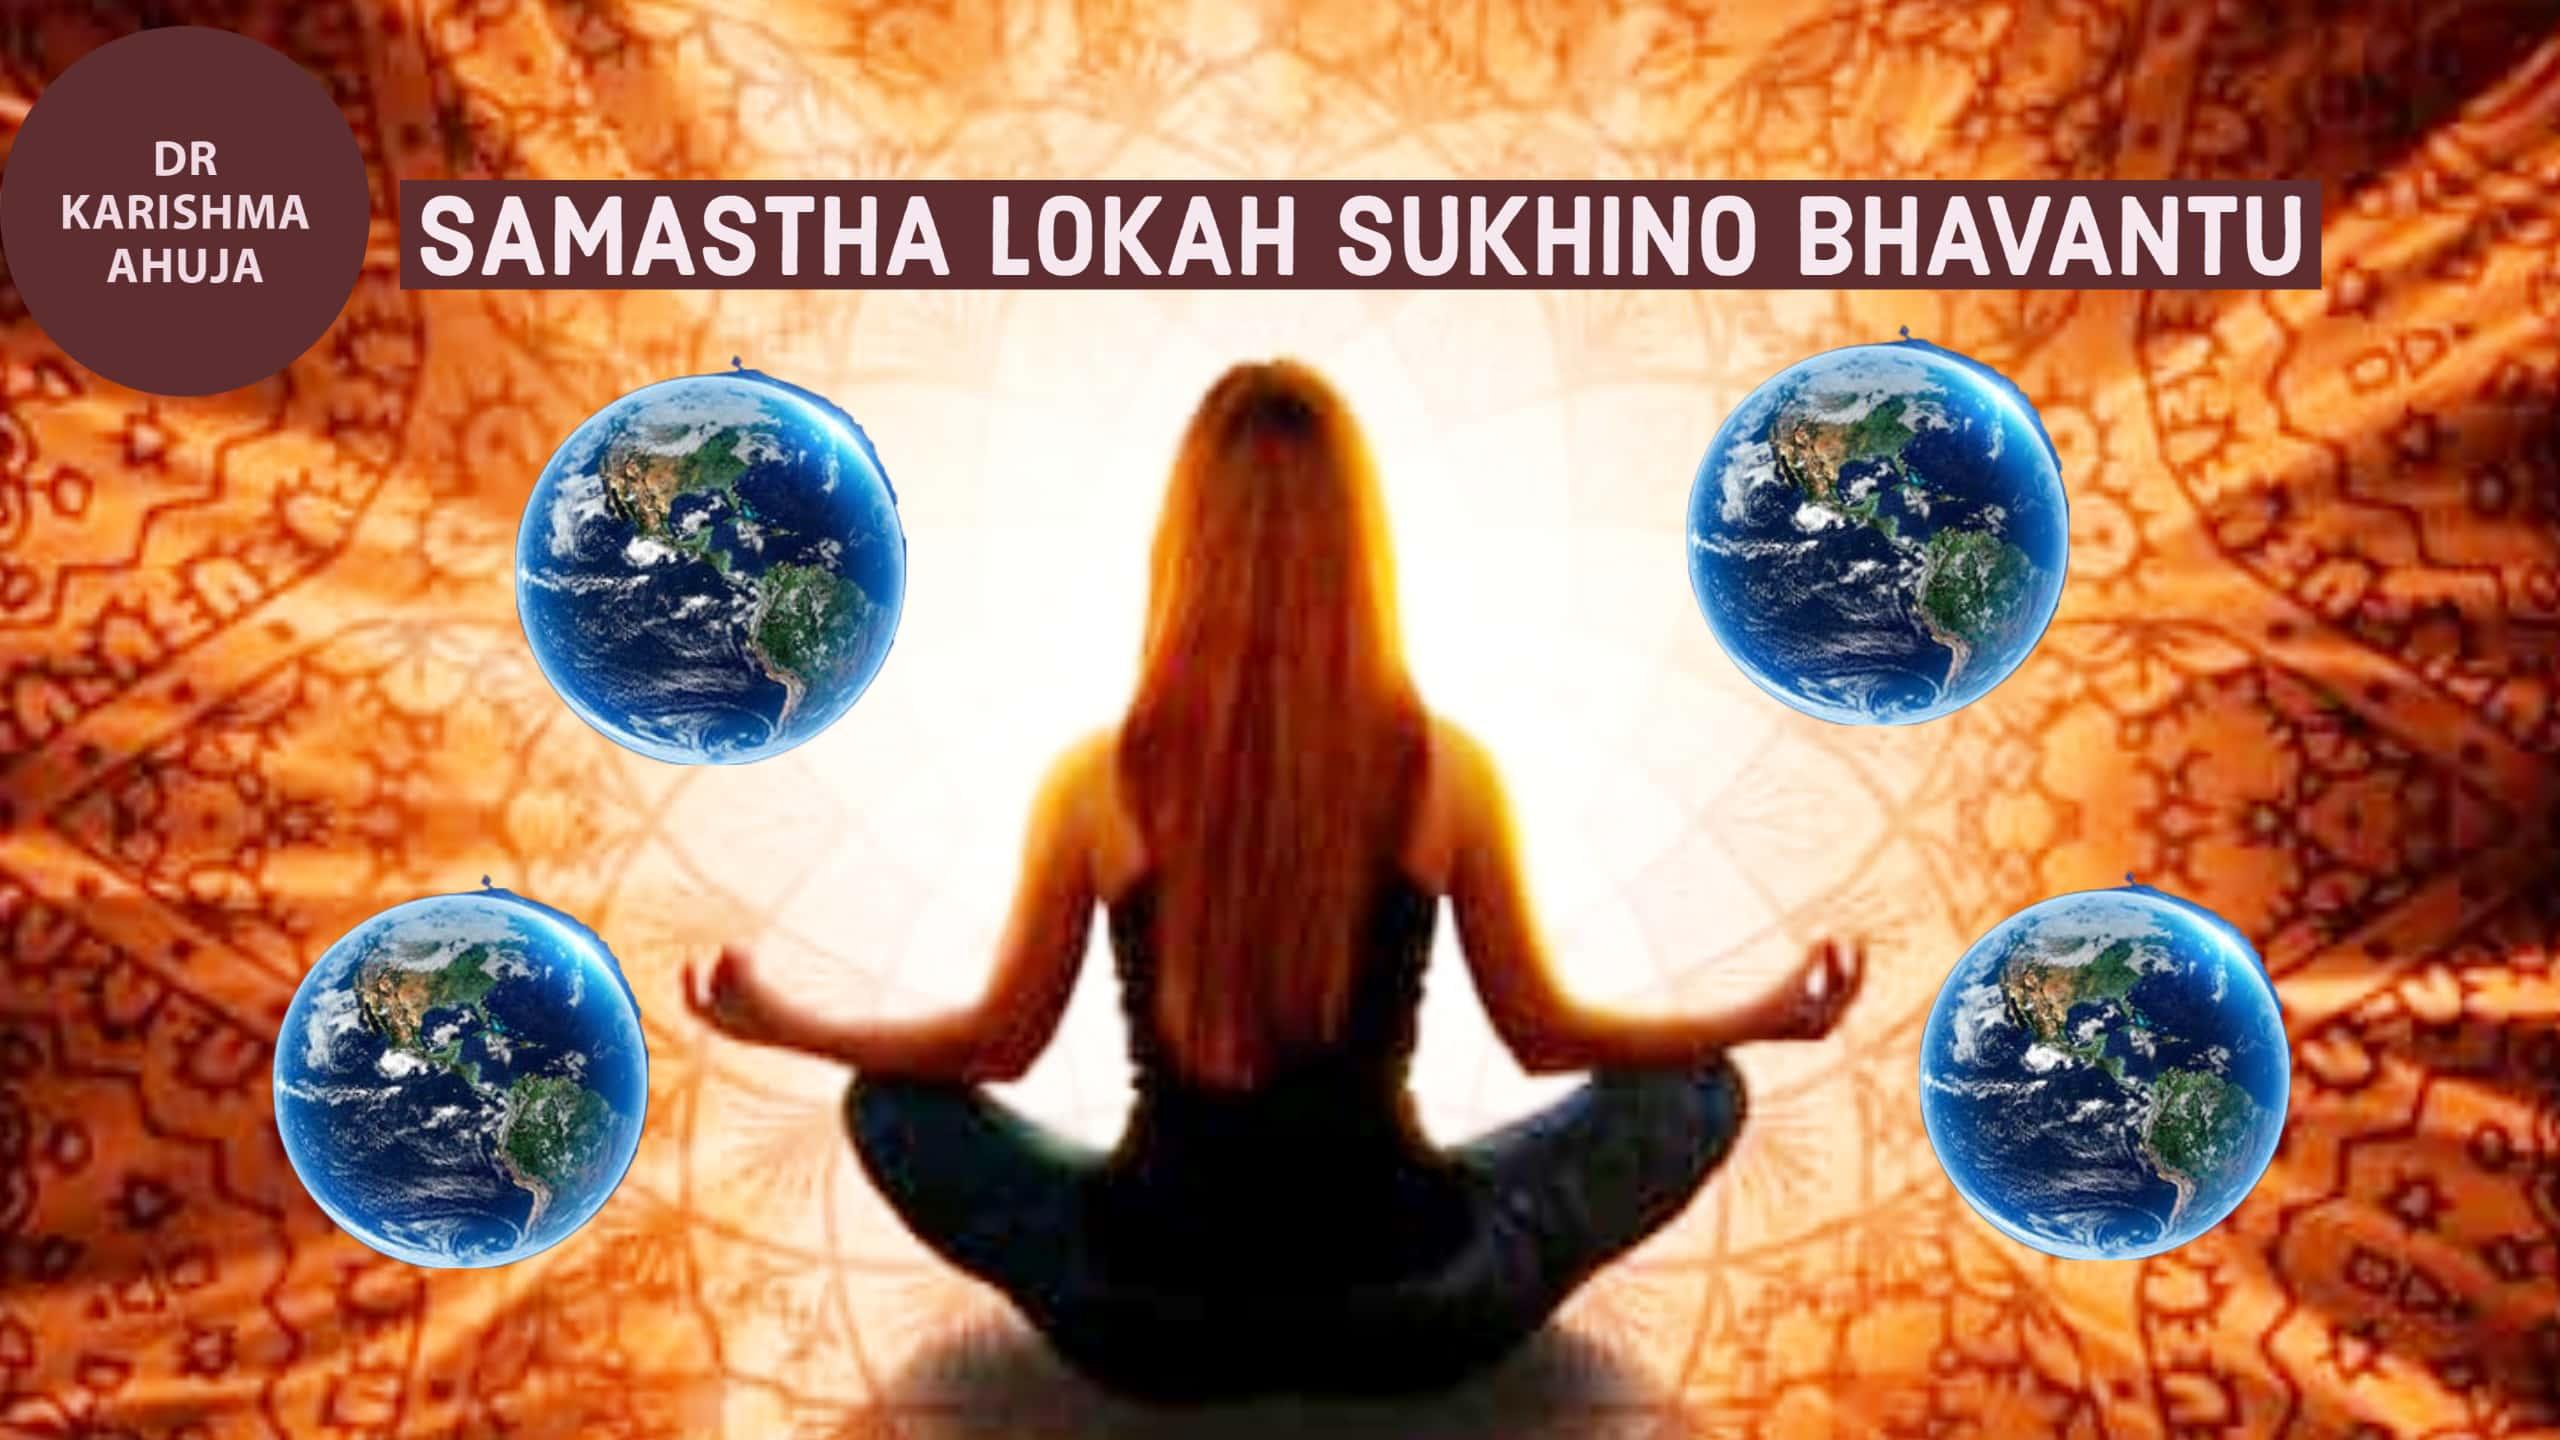 Samastha Lokah Sukhino Bhavantu – Cosmic Mahamantra for Healing the World